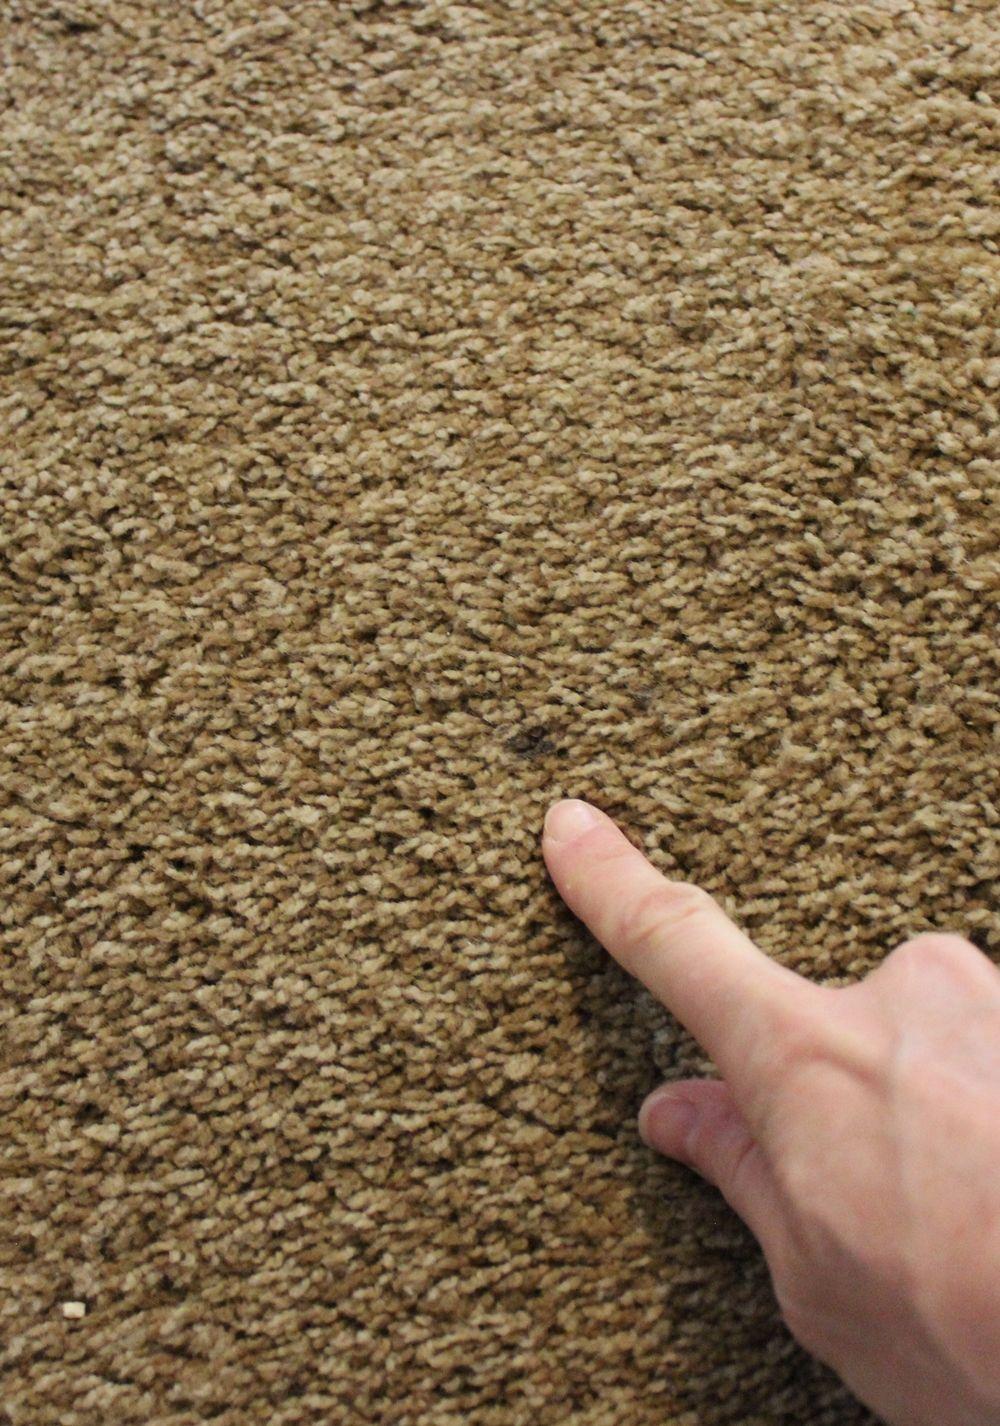 DIY Carpet Cleaner - spot